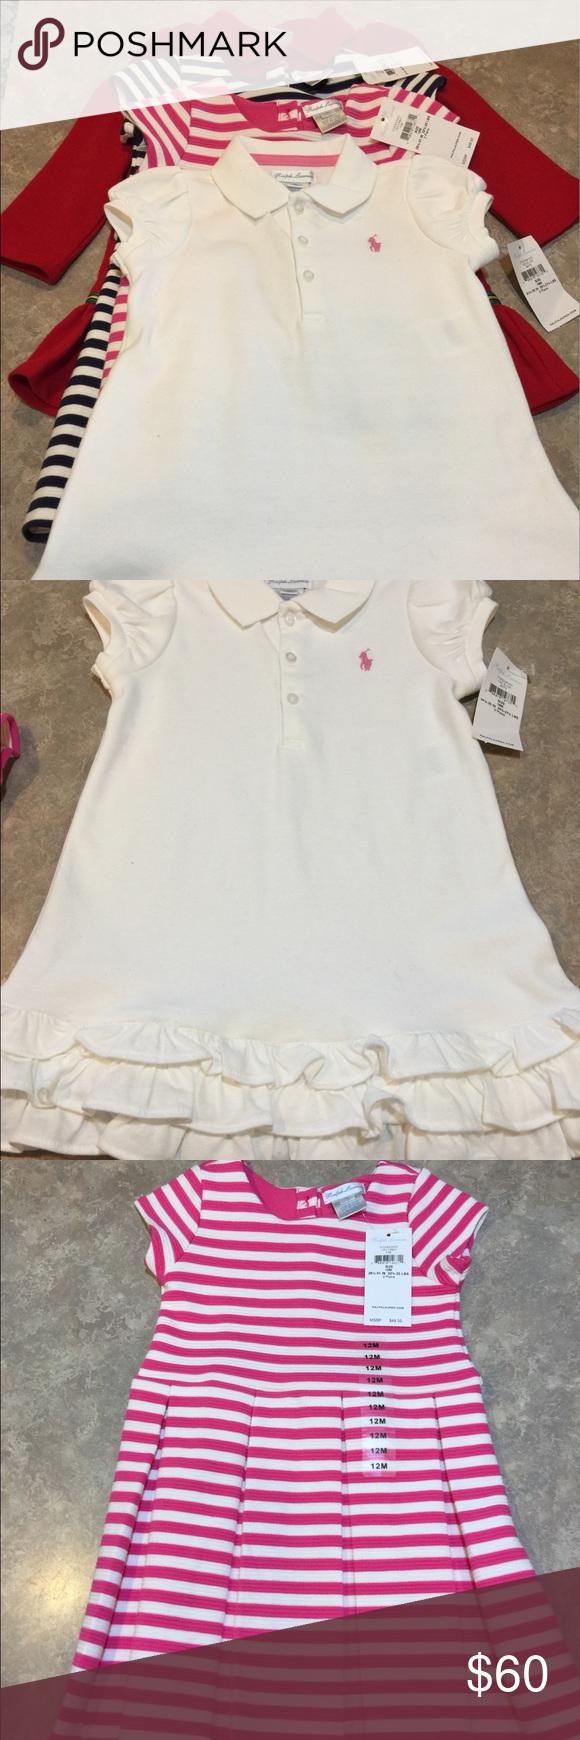 0ad083c2 4 Ralph Lauren Little Girls Dresses NWT NWT | My Posh Picks ...